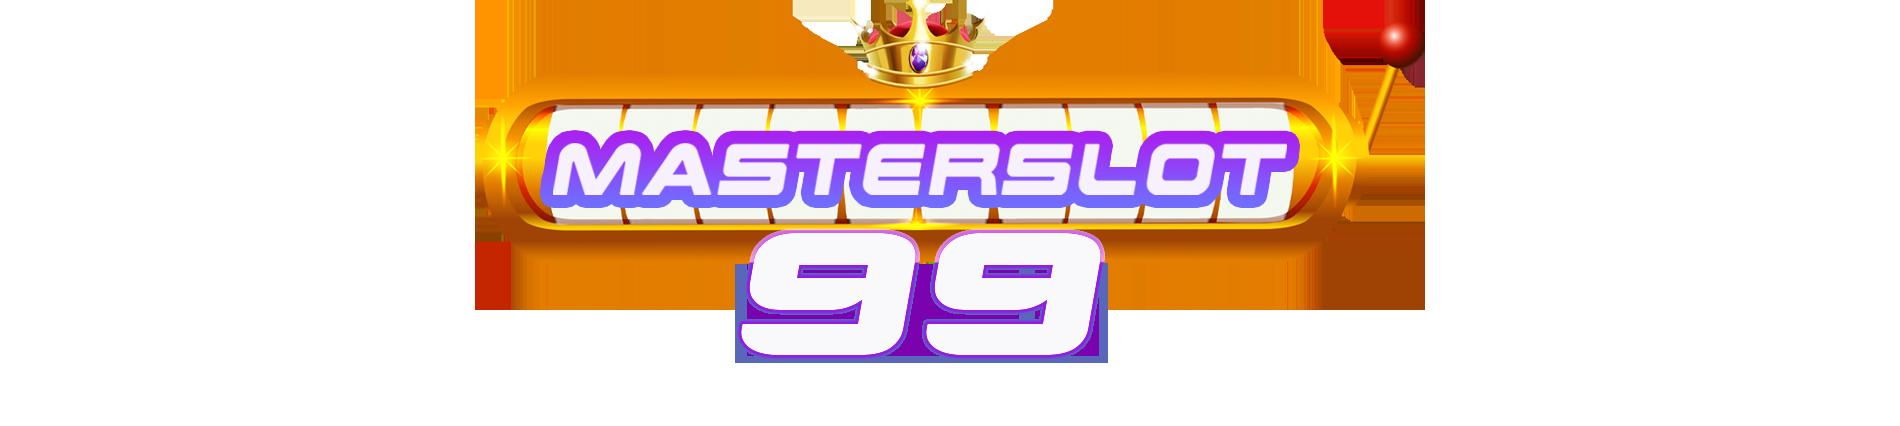 MASTERSLOT99 Situs Judi Slot Online Deposit Pulsa XL Tanpa Potongan